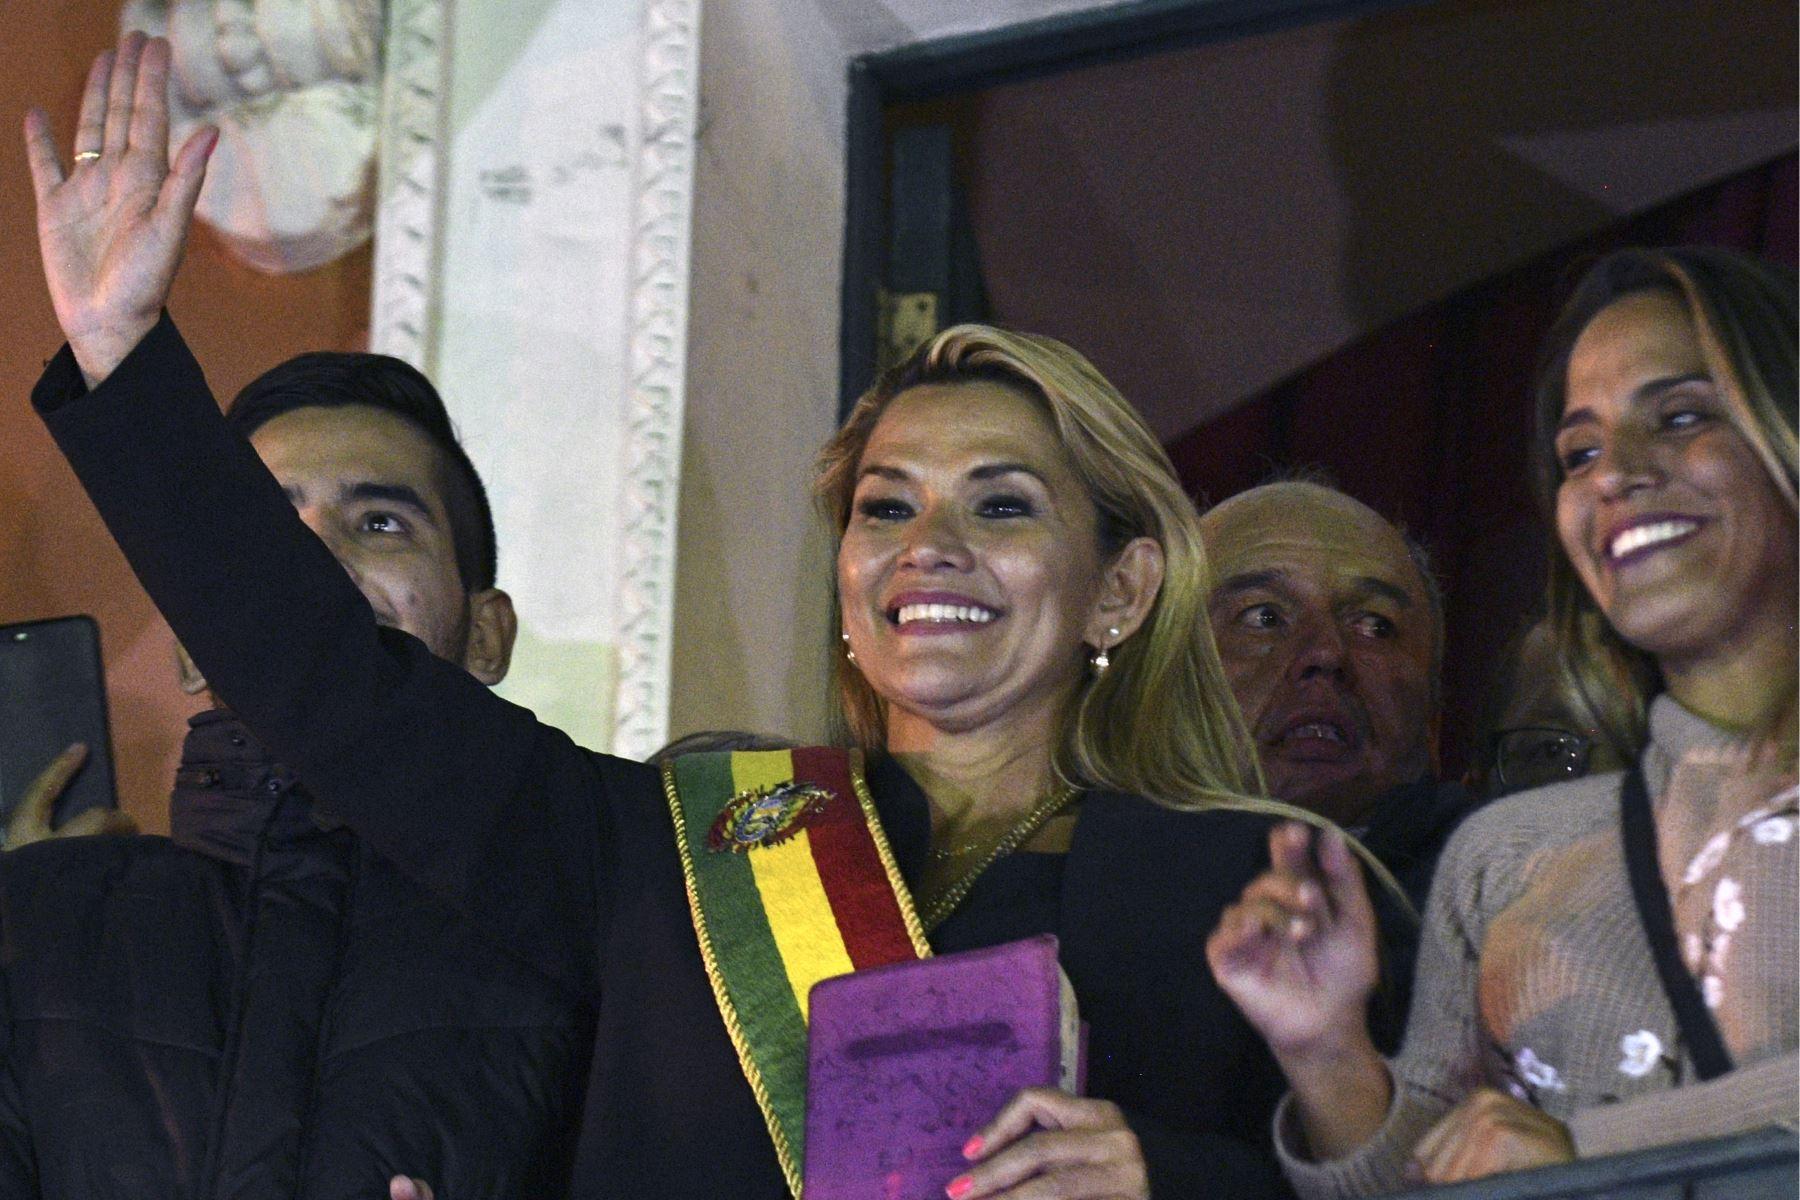 La vicepresidenta del Senado, Jeanine Anez, se proclama como el nuevo presidente interino de Bolivia. Foto: AFP